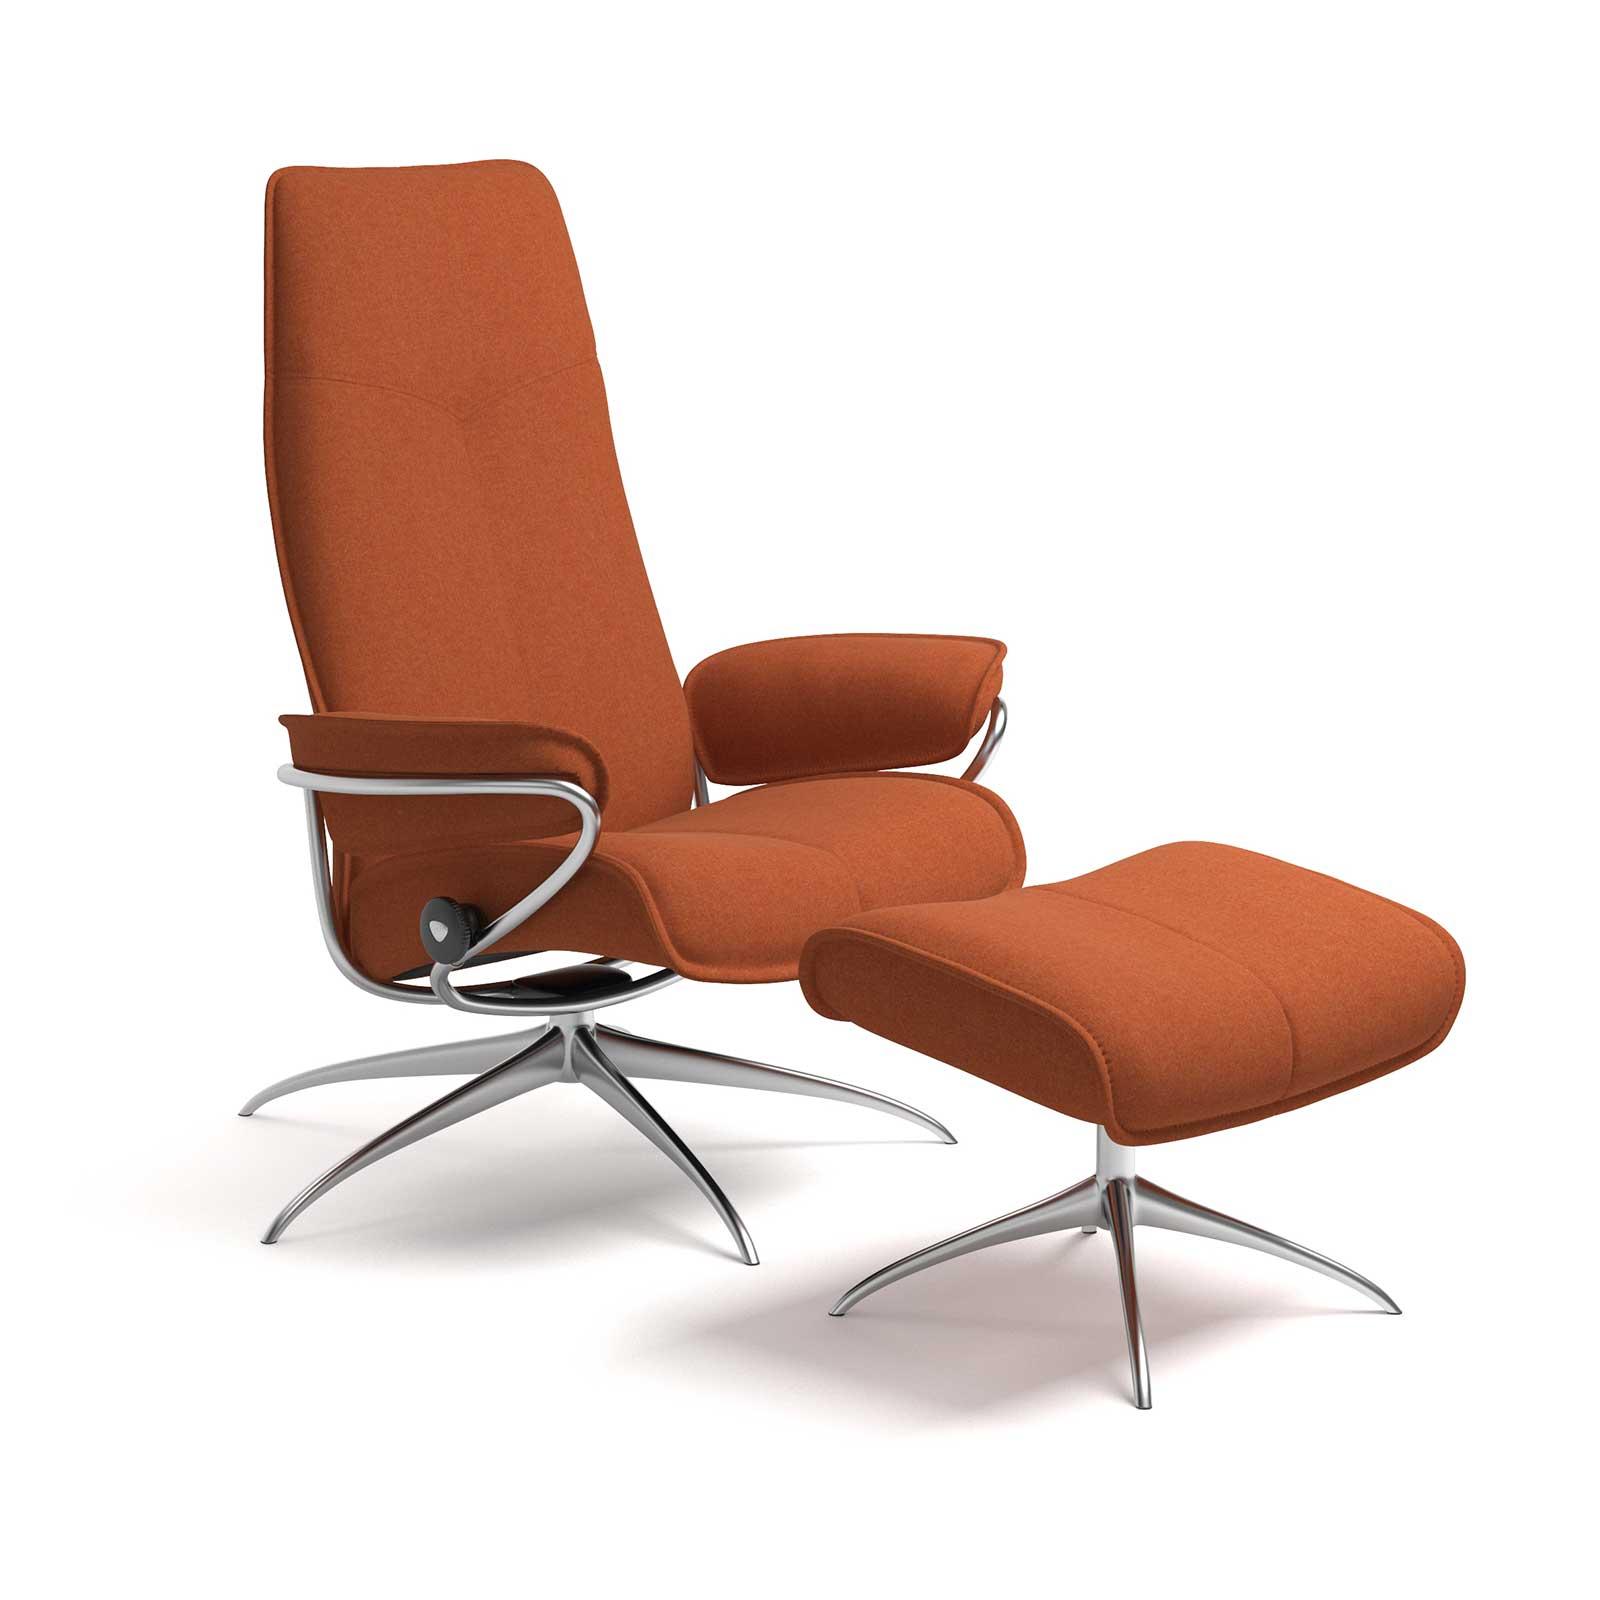 stressless city high back calido orange gestell chrom mit hocker. Black Bedroom Furniture Sets. Home Design Ideas